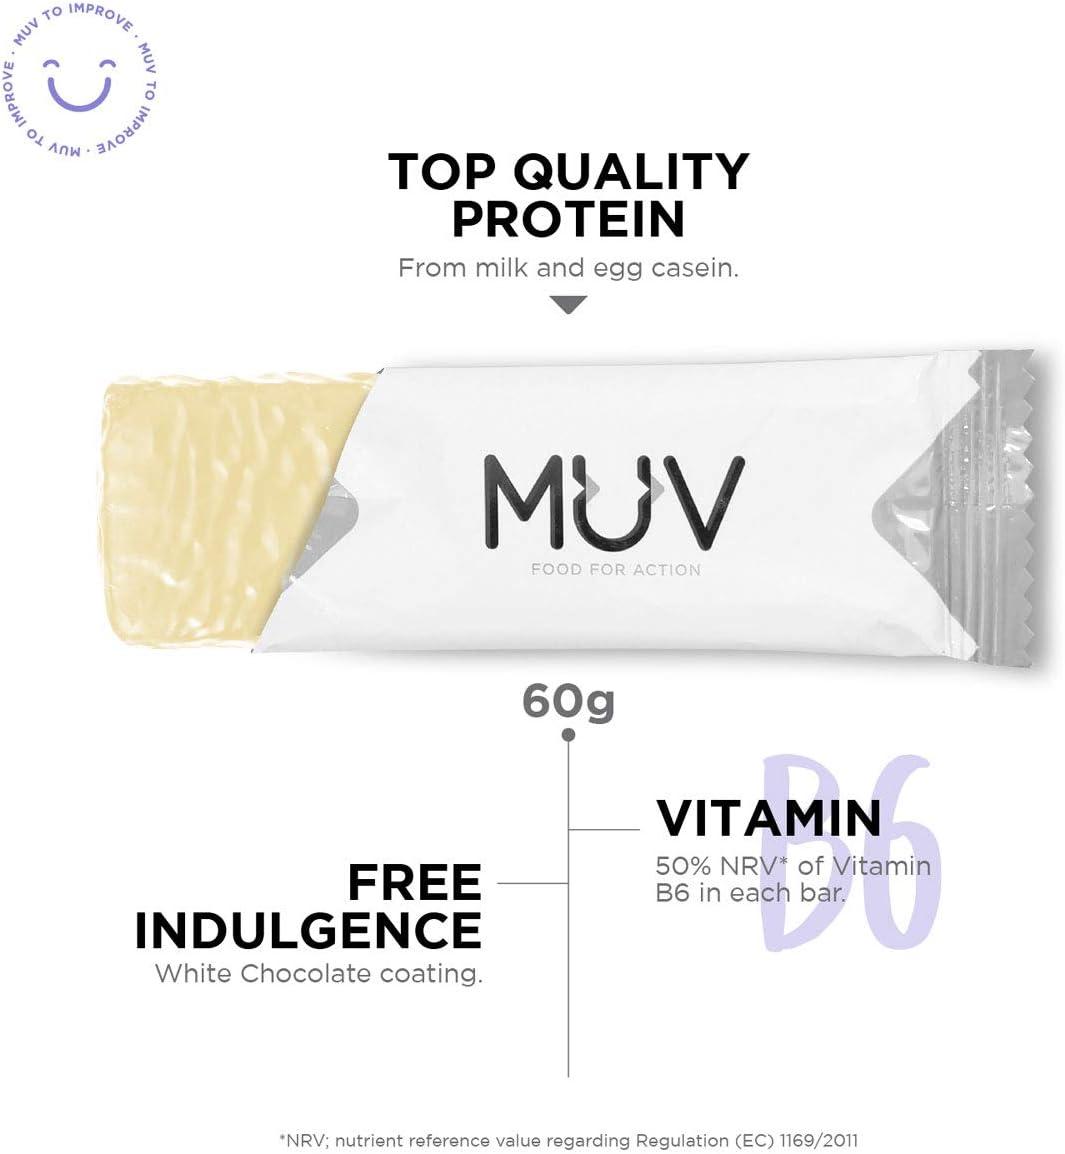 Muv Food For Action - Barras de proteína sabor stracciatella, 12 unidades de 60 g